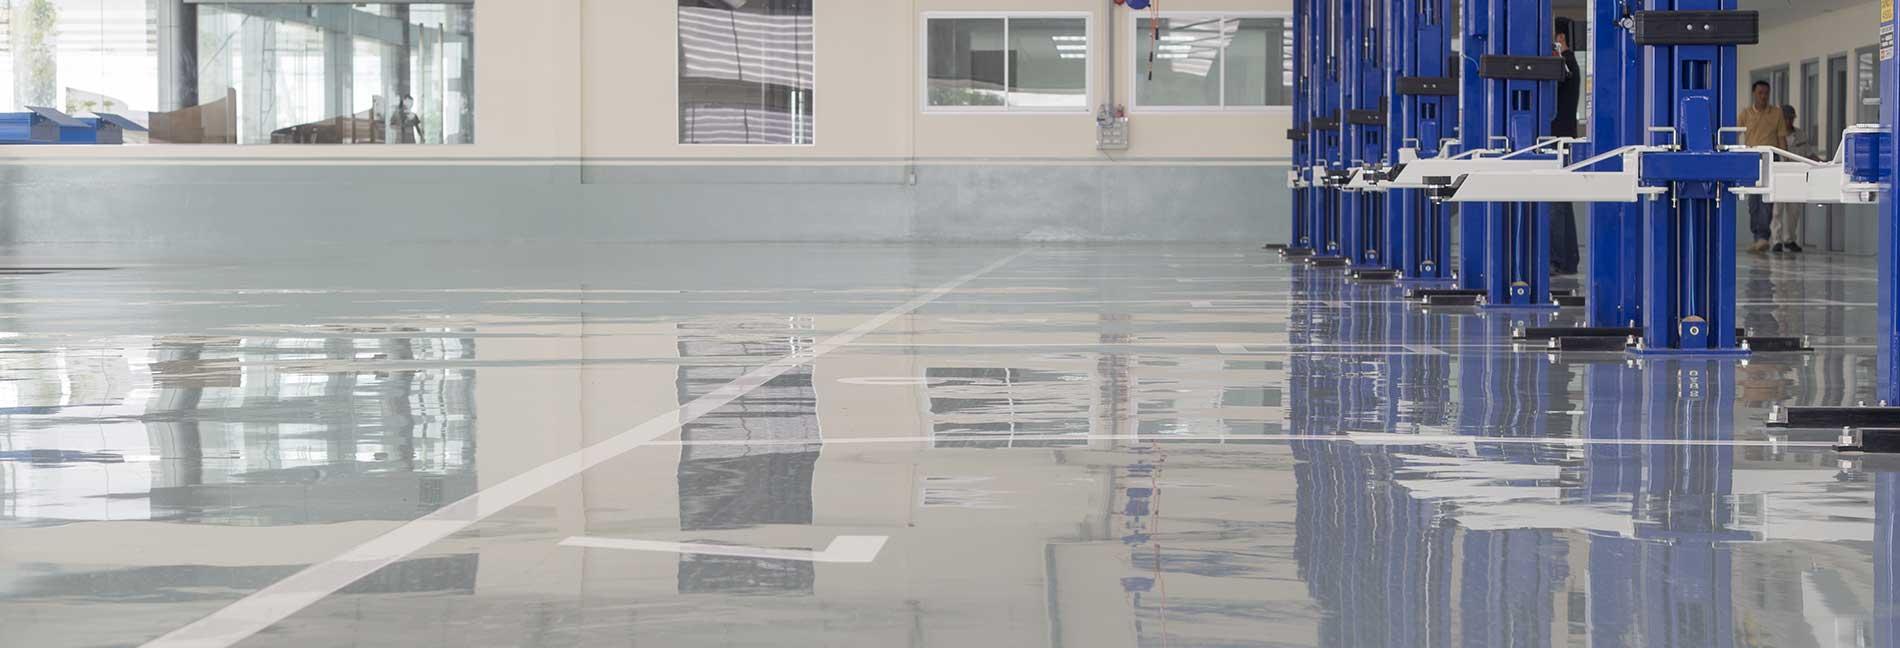 commercial-shop-floors